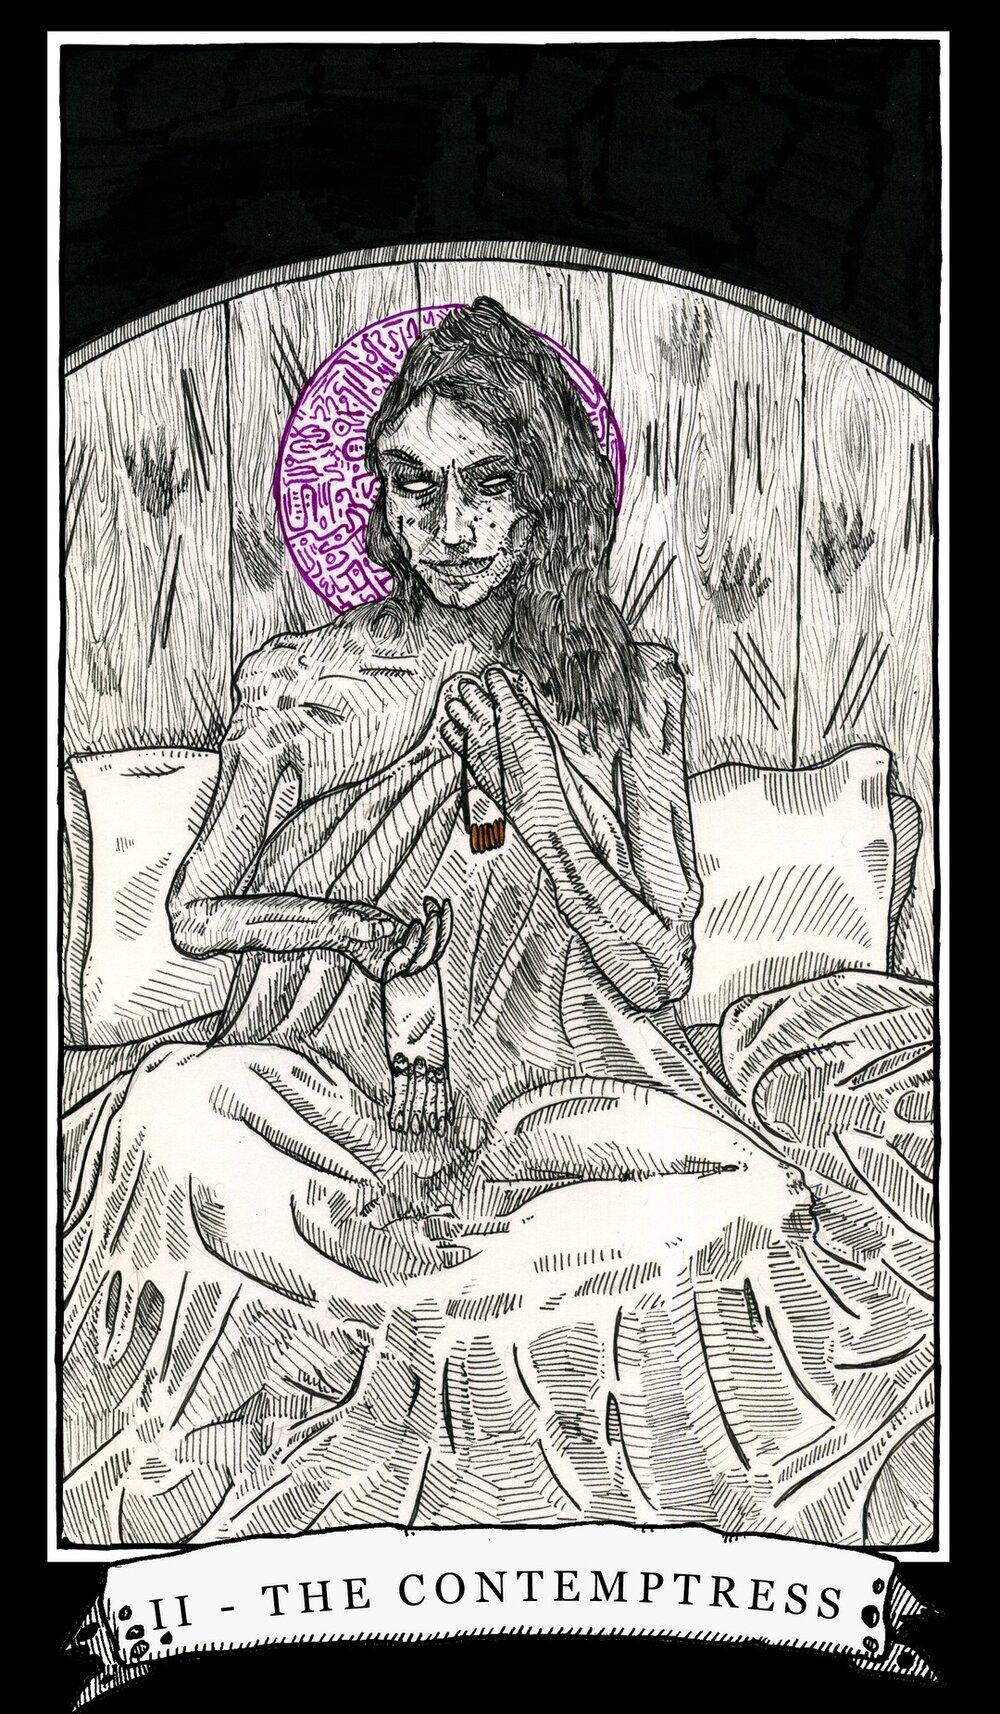 the contemptress.png